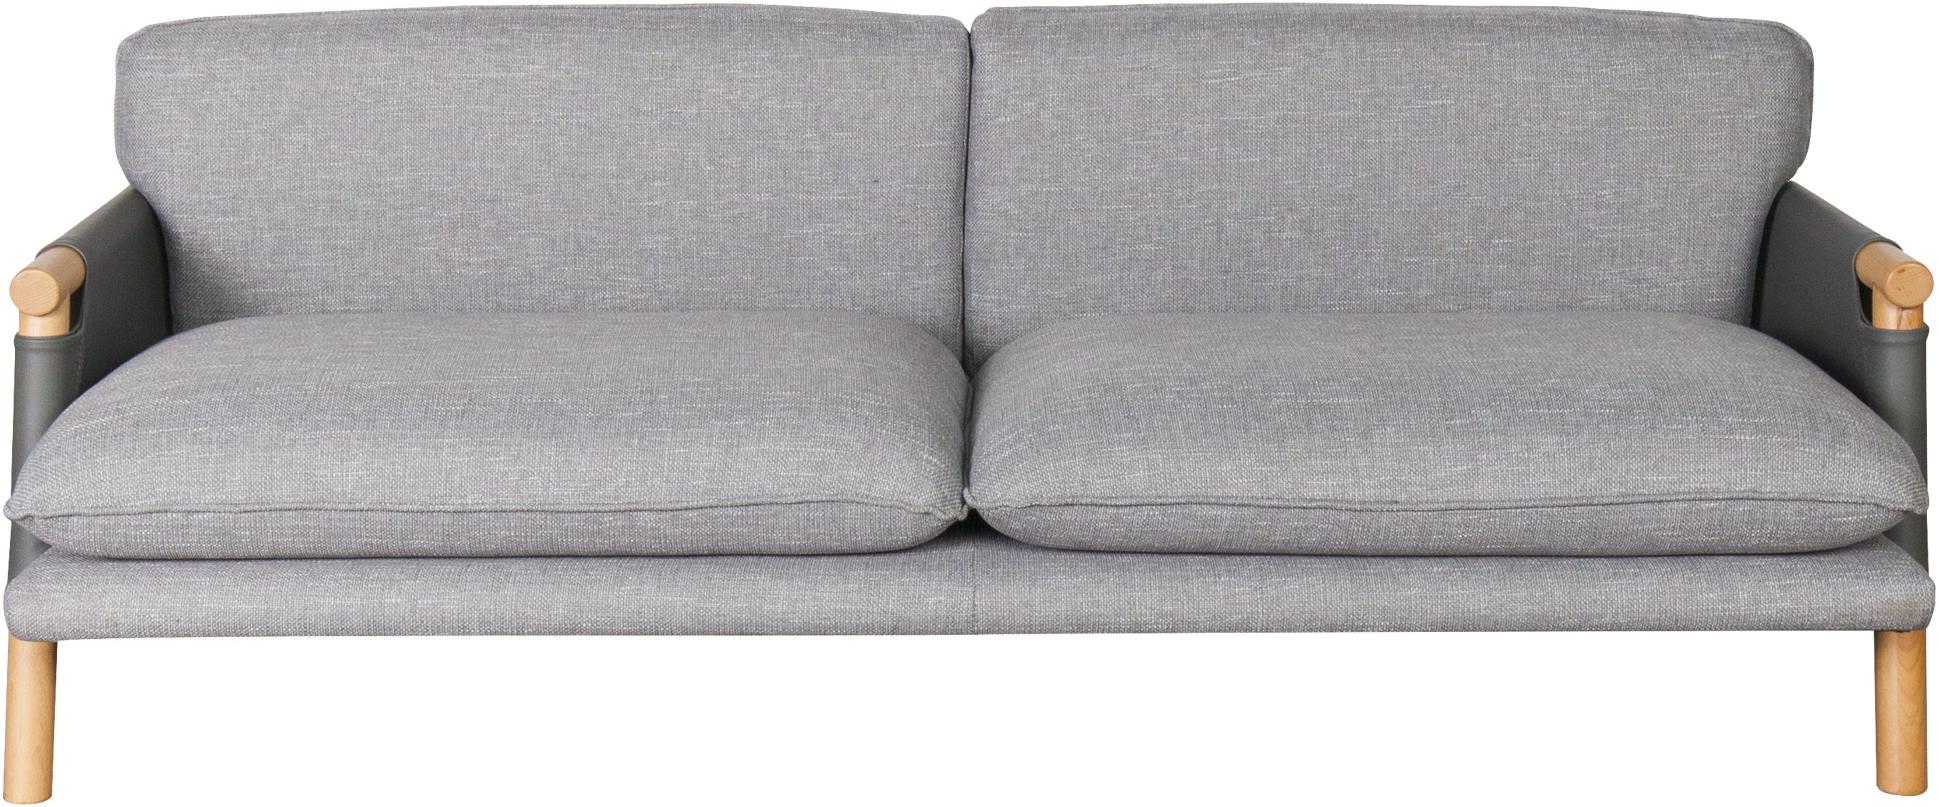 Finn lounge